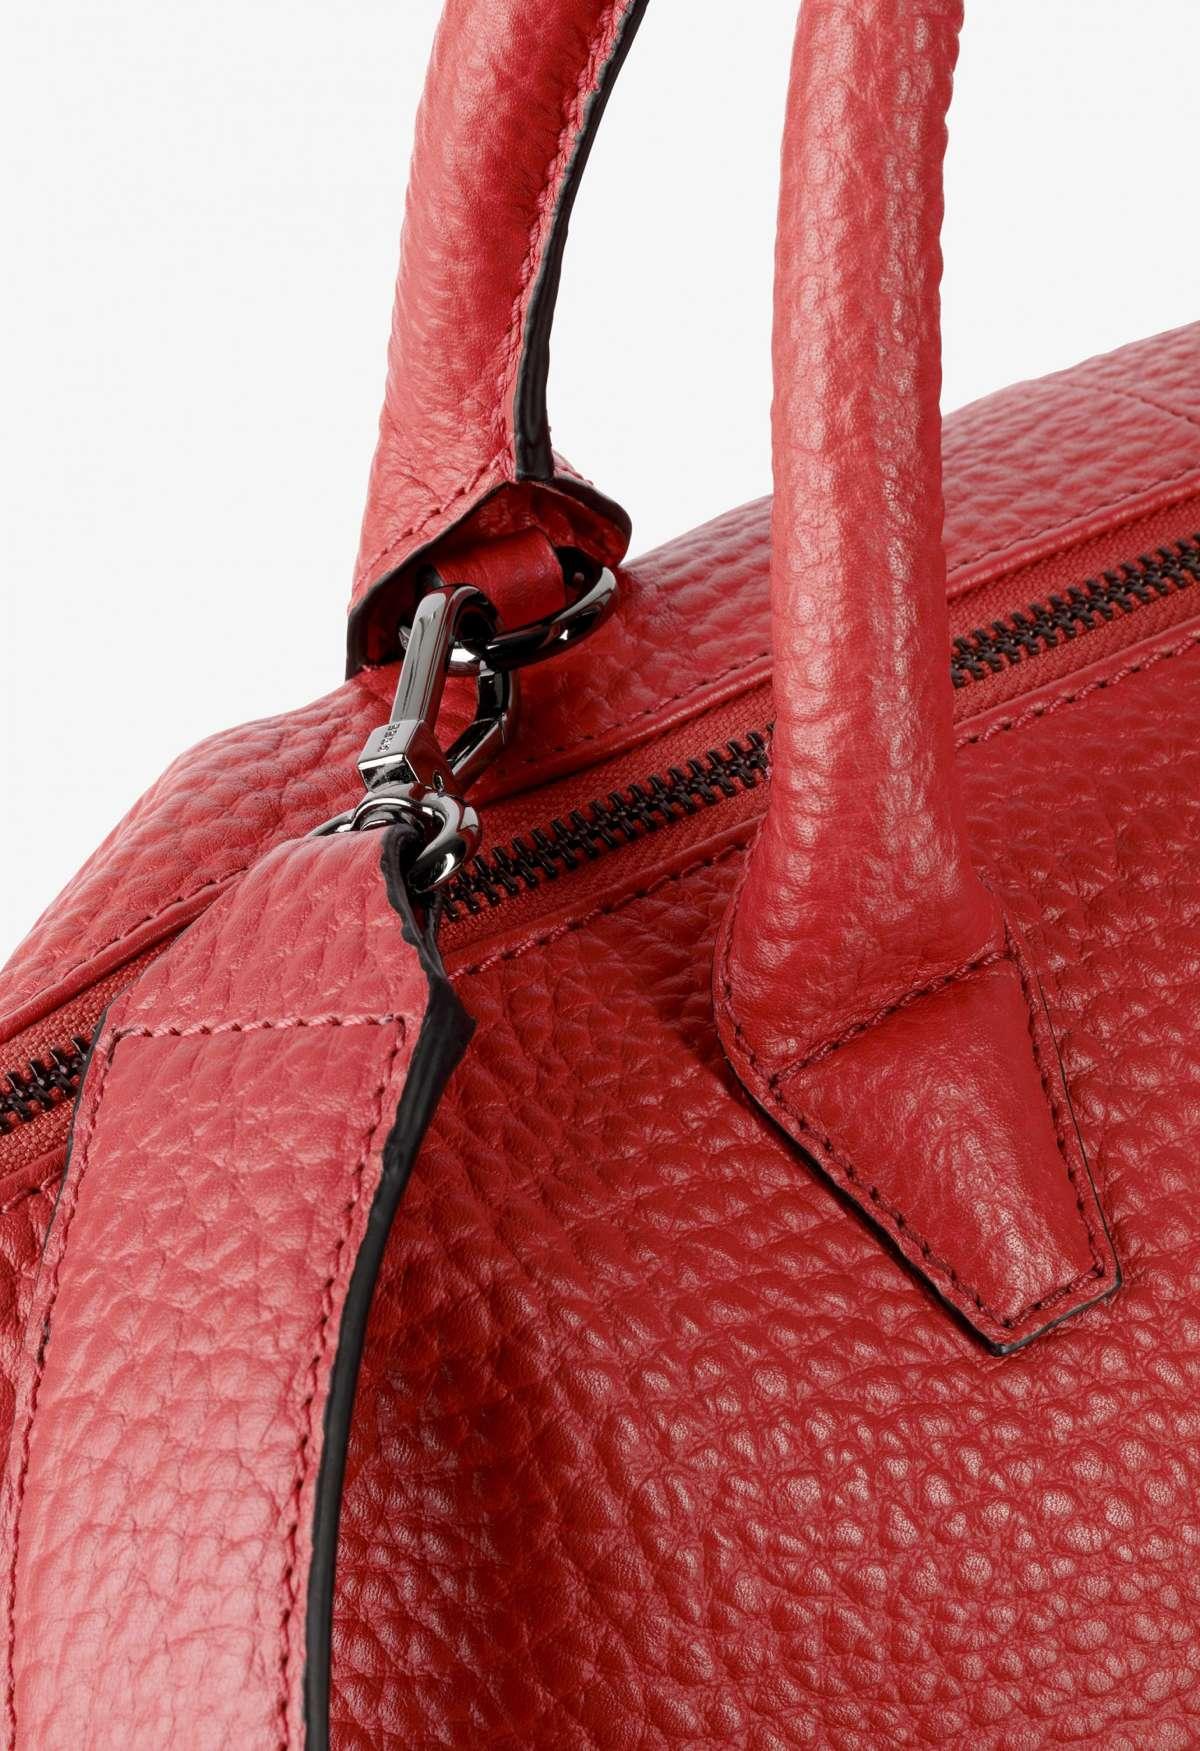 e20a925055498 BREE Icon Bag Handtasche Leder - stylekrone.com